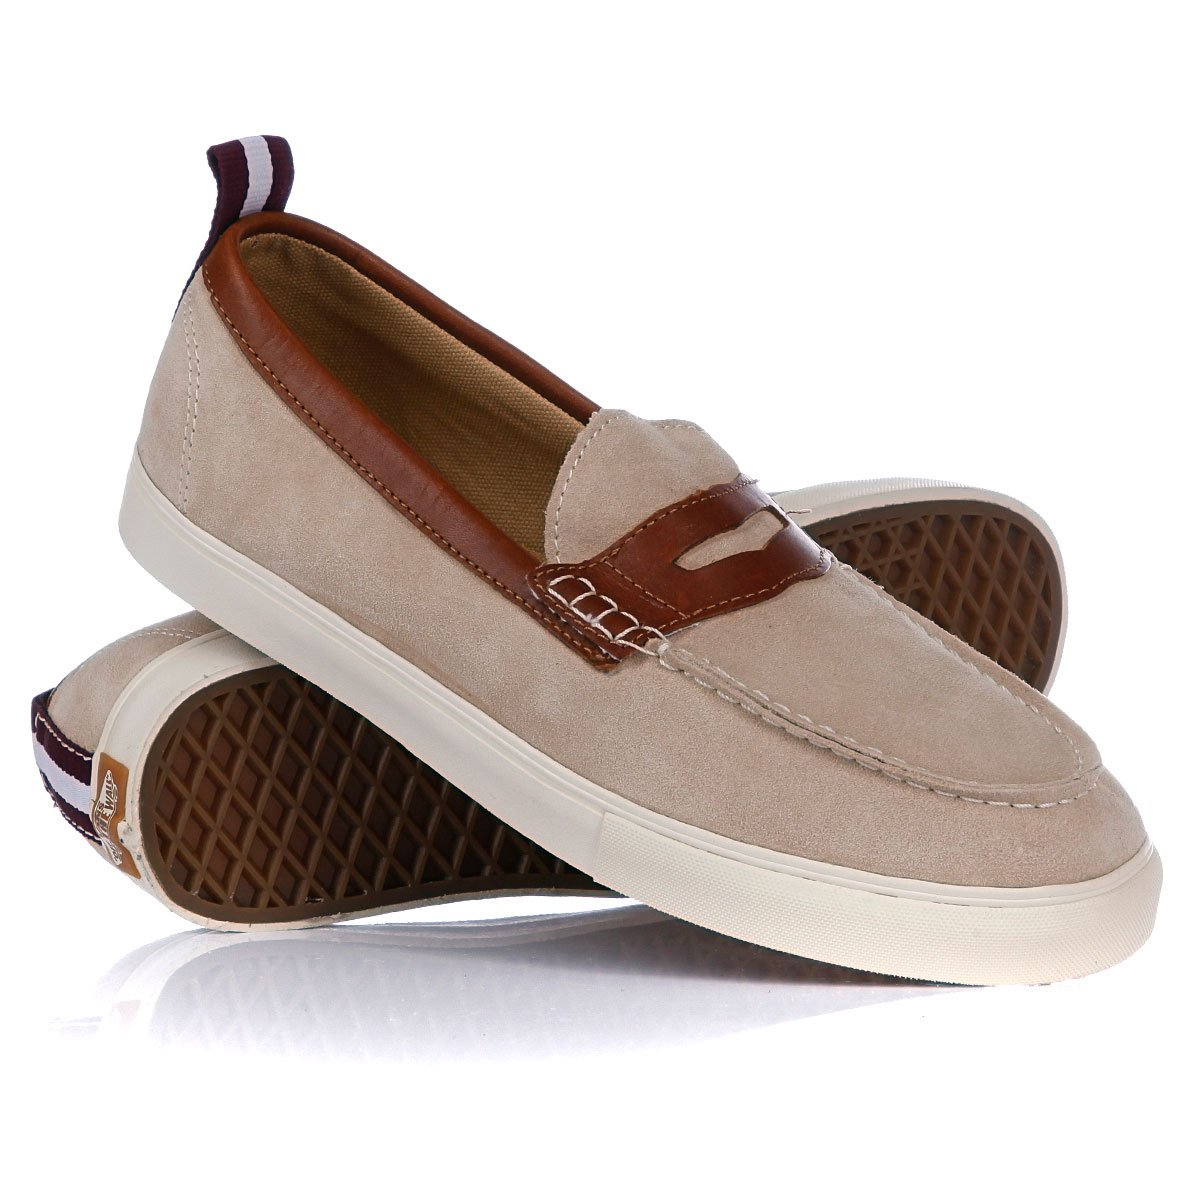 03df7ee158d Купить мокасины Vans Lp Penny Loafer Ca Suede Leather Taupe Brown ...